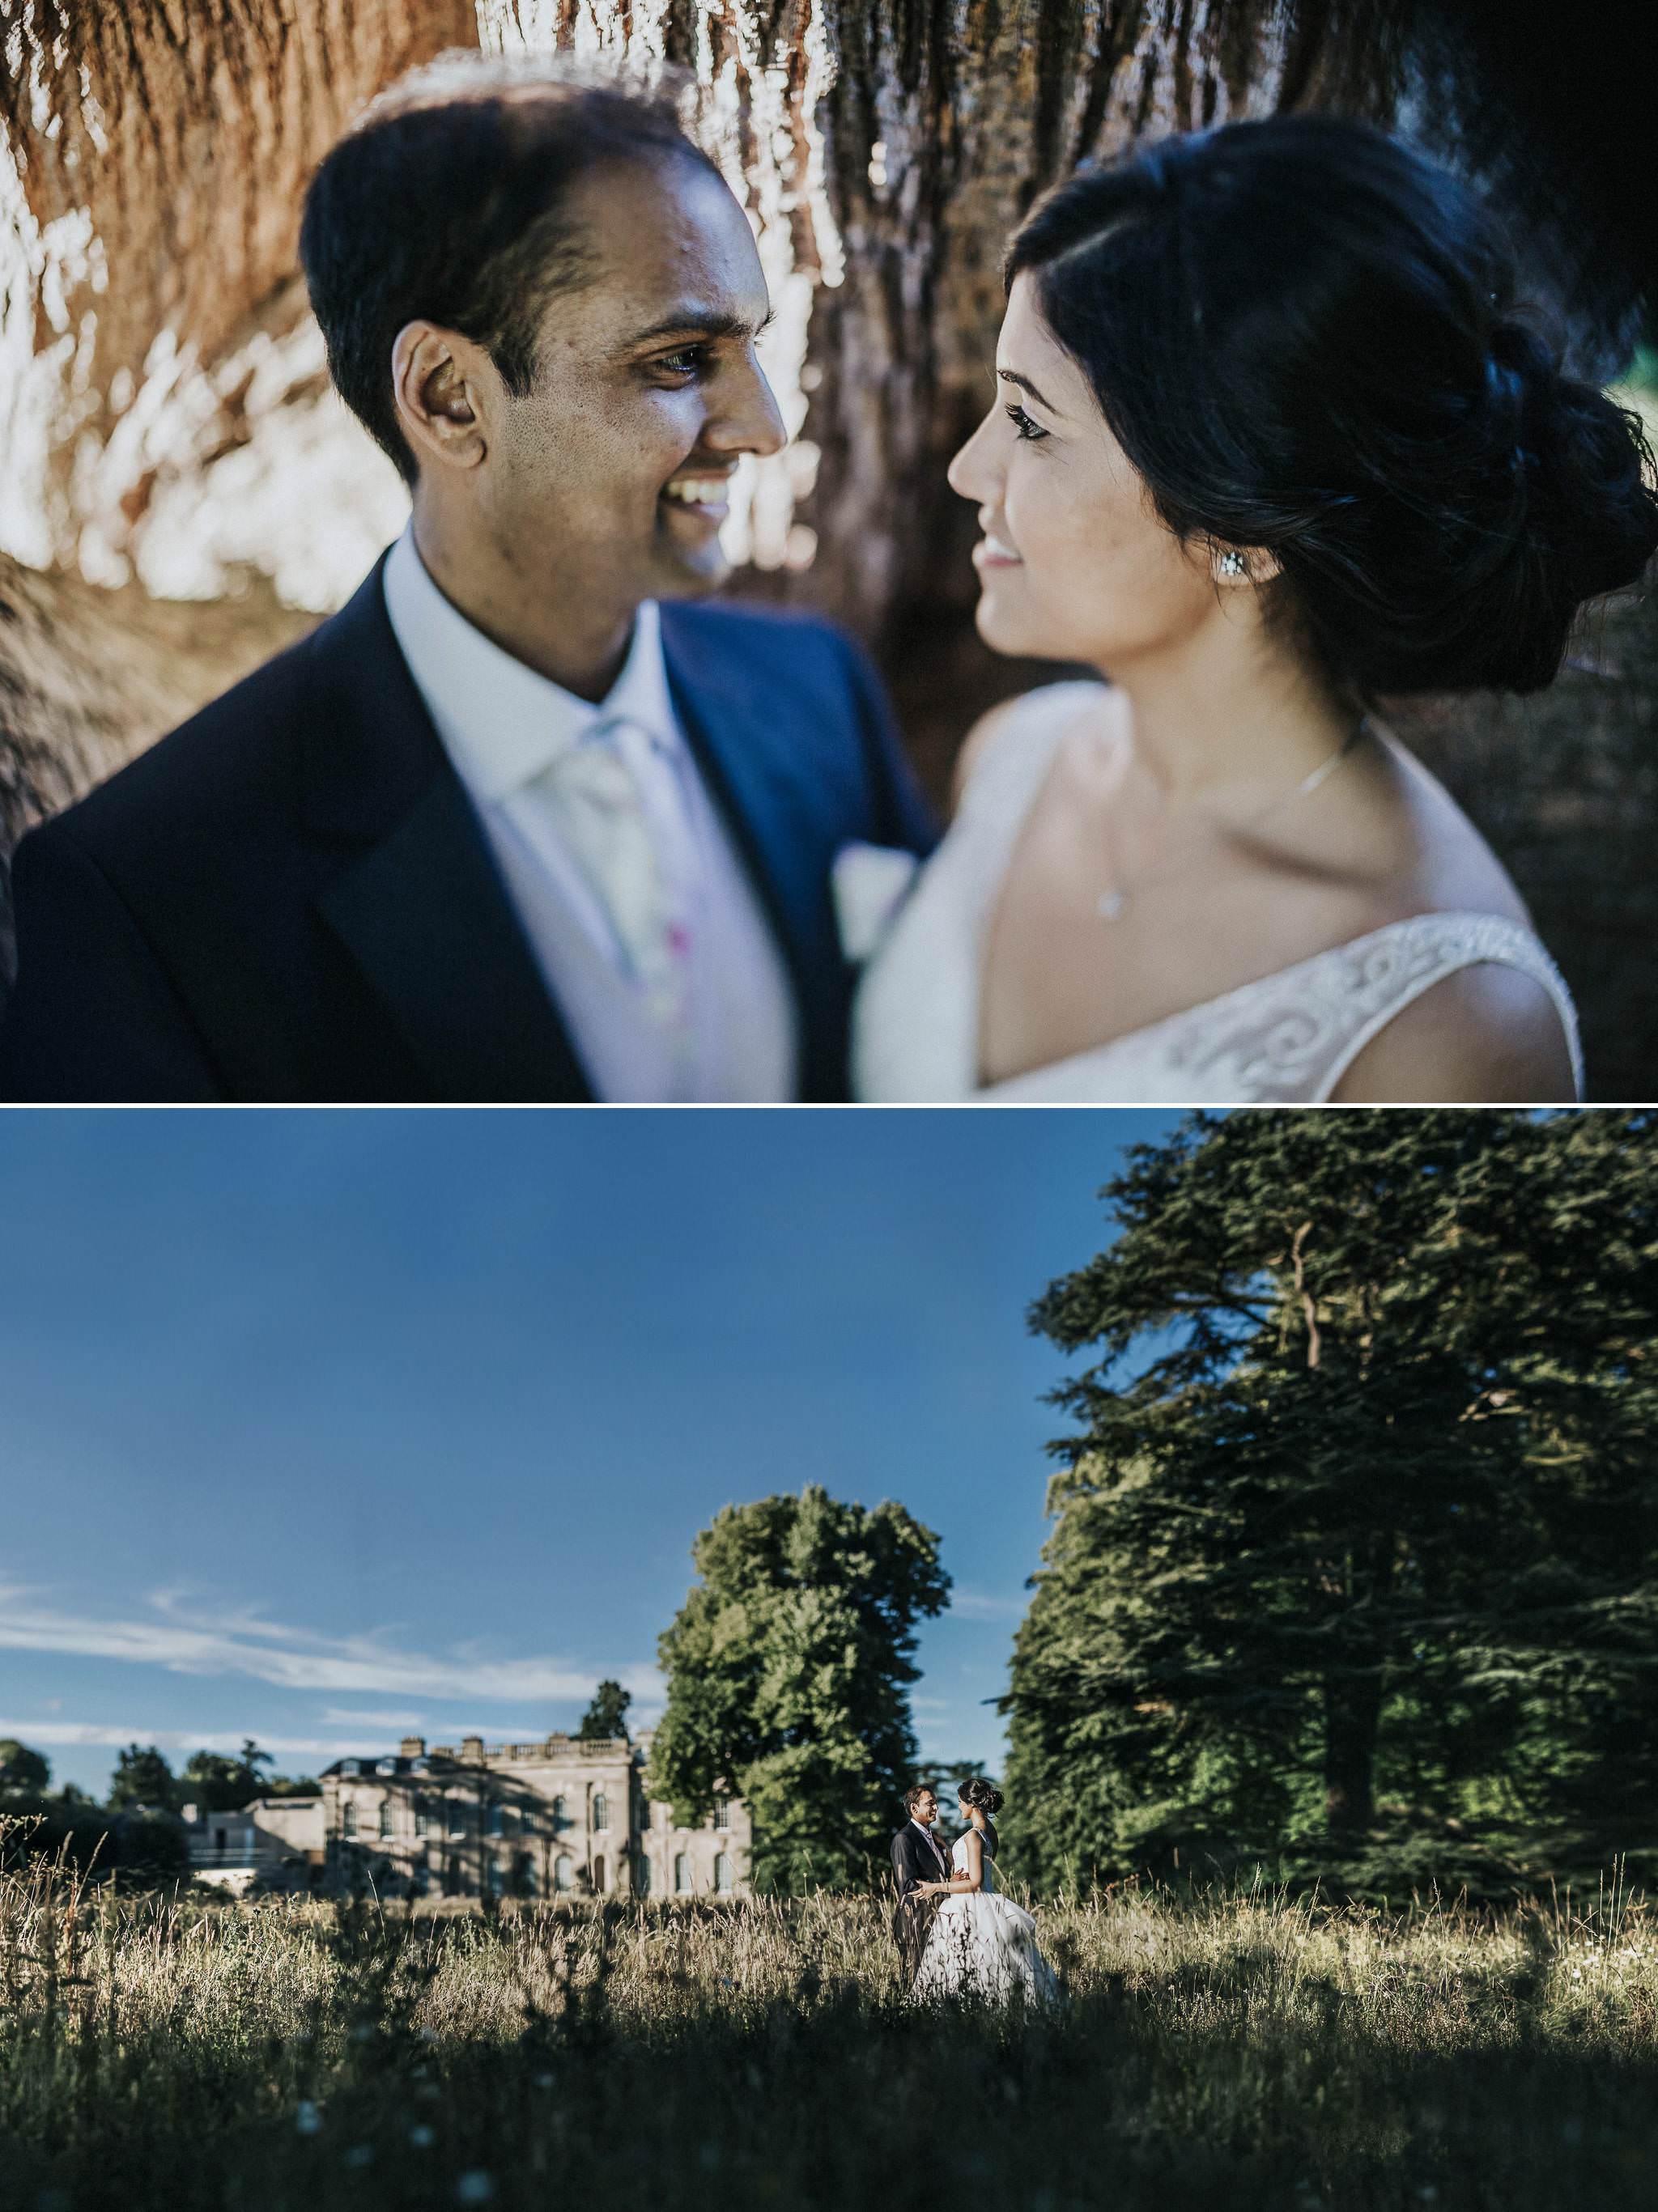 compton-verney-wedding-photos 25.jpg